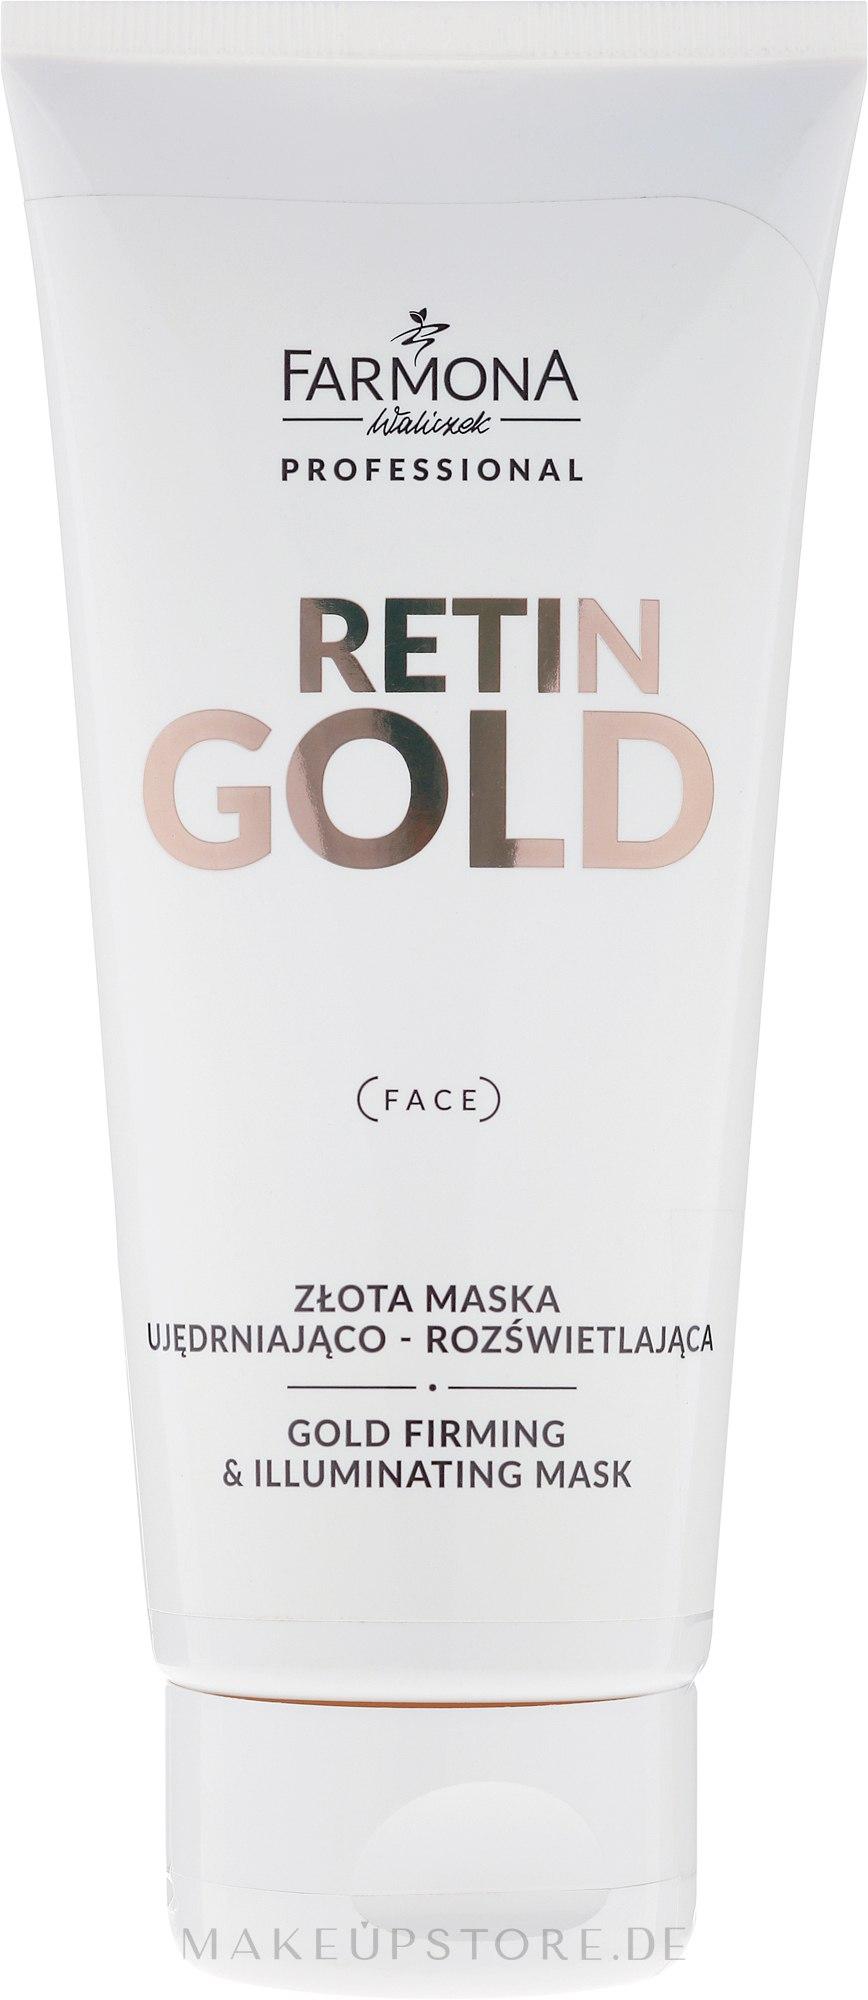 Algen-Gesichtsmaske mit kolloidalem Gold - Farmona Professional Retin Gold Mask — Bild 200 ml